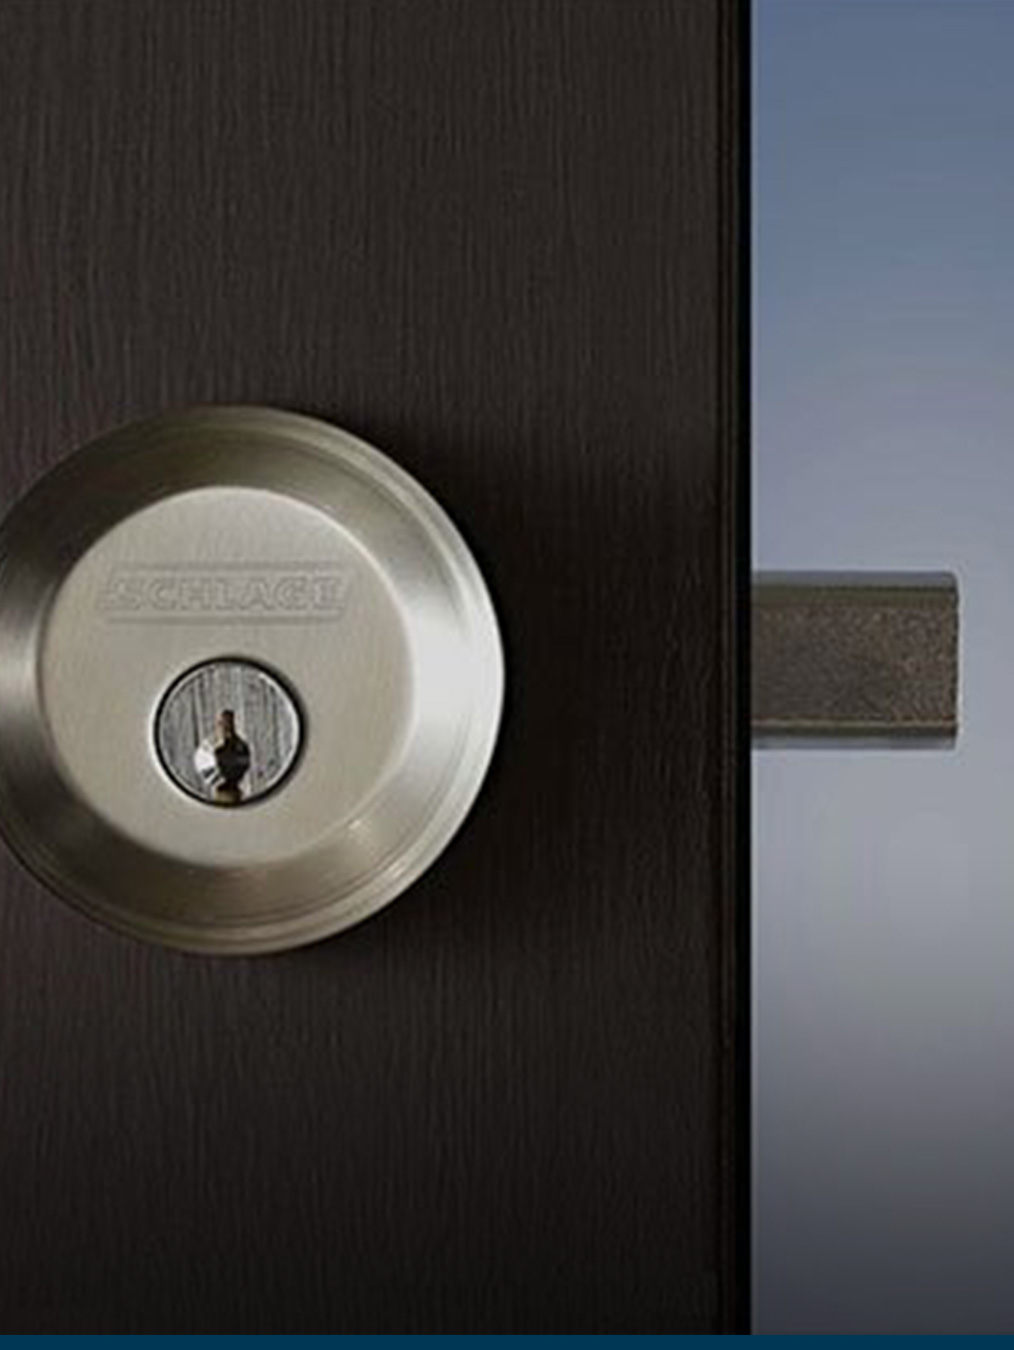 Sopersmac Specialist Hardware Deadbolt Lock Parts Home Door Diagram General